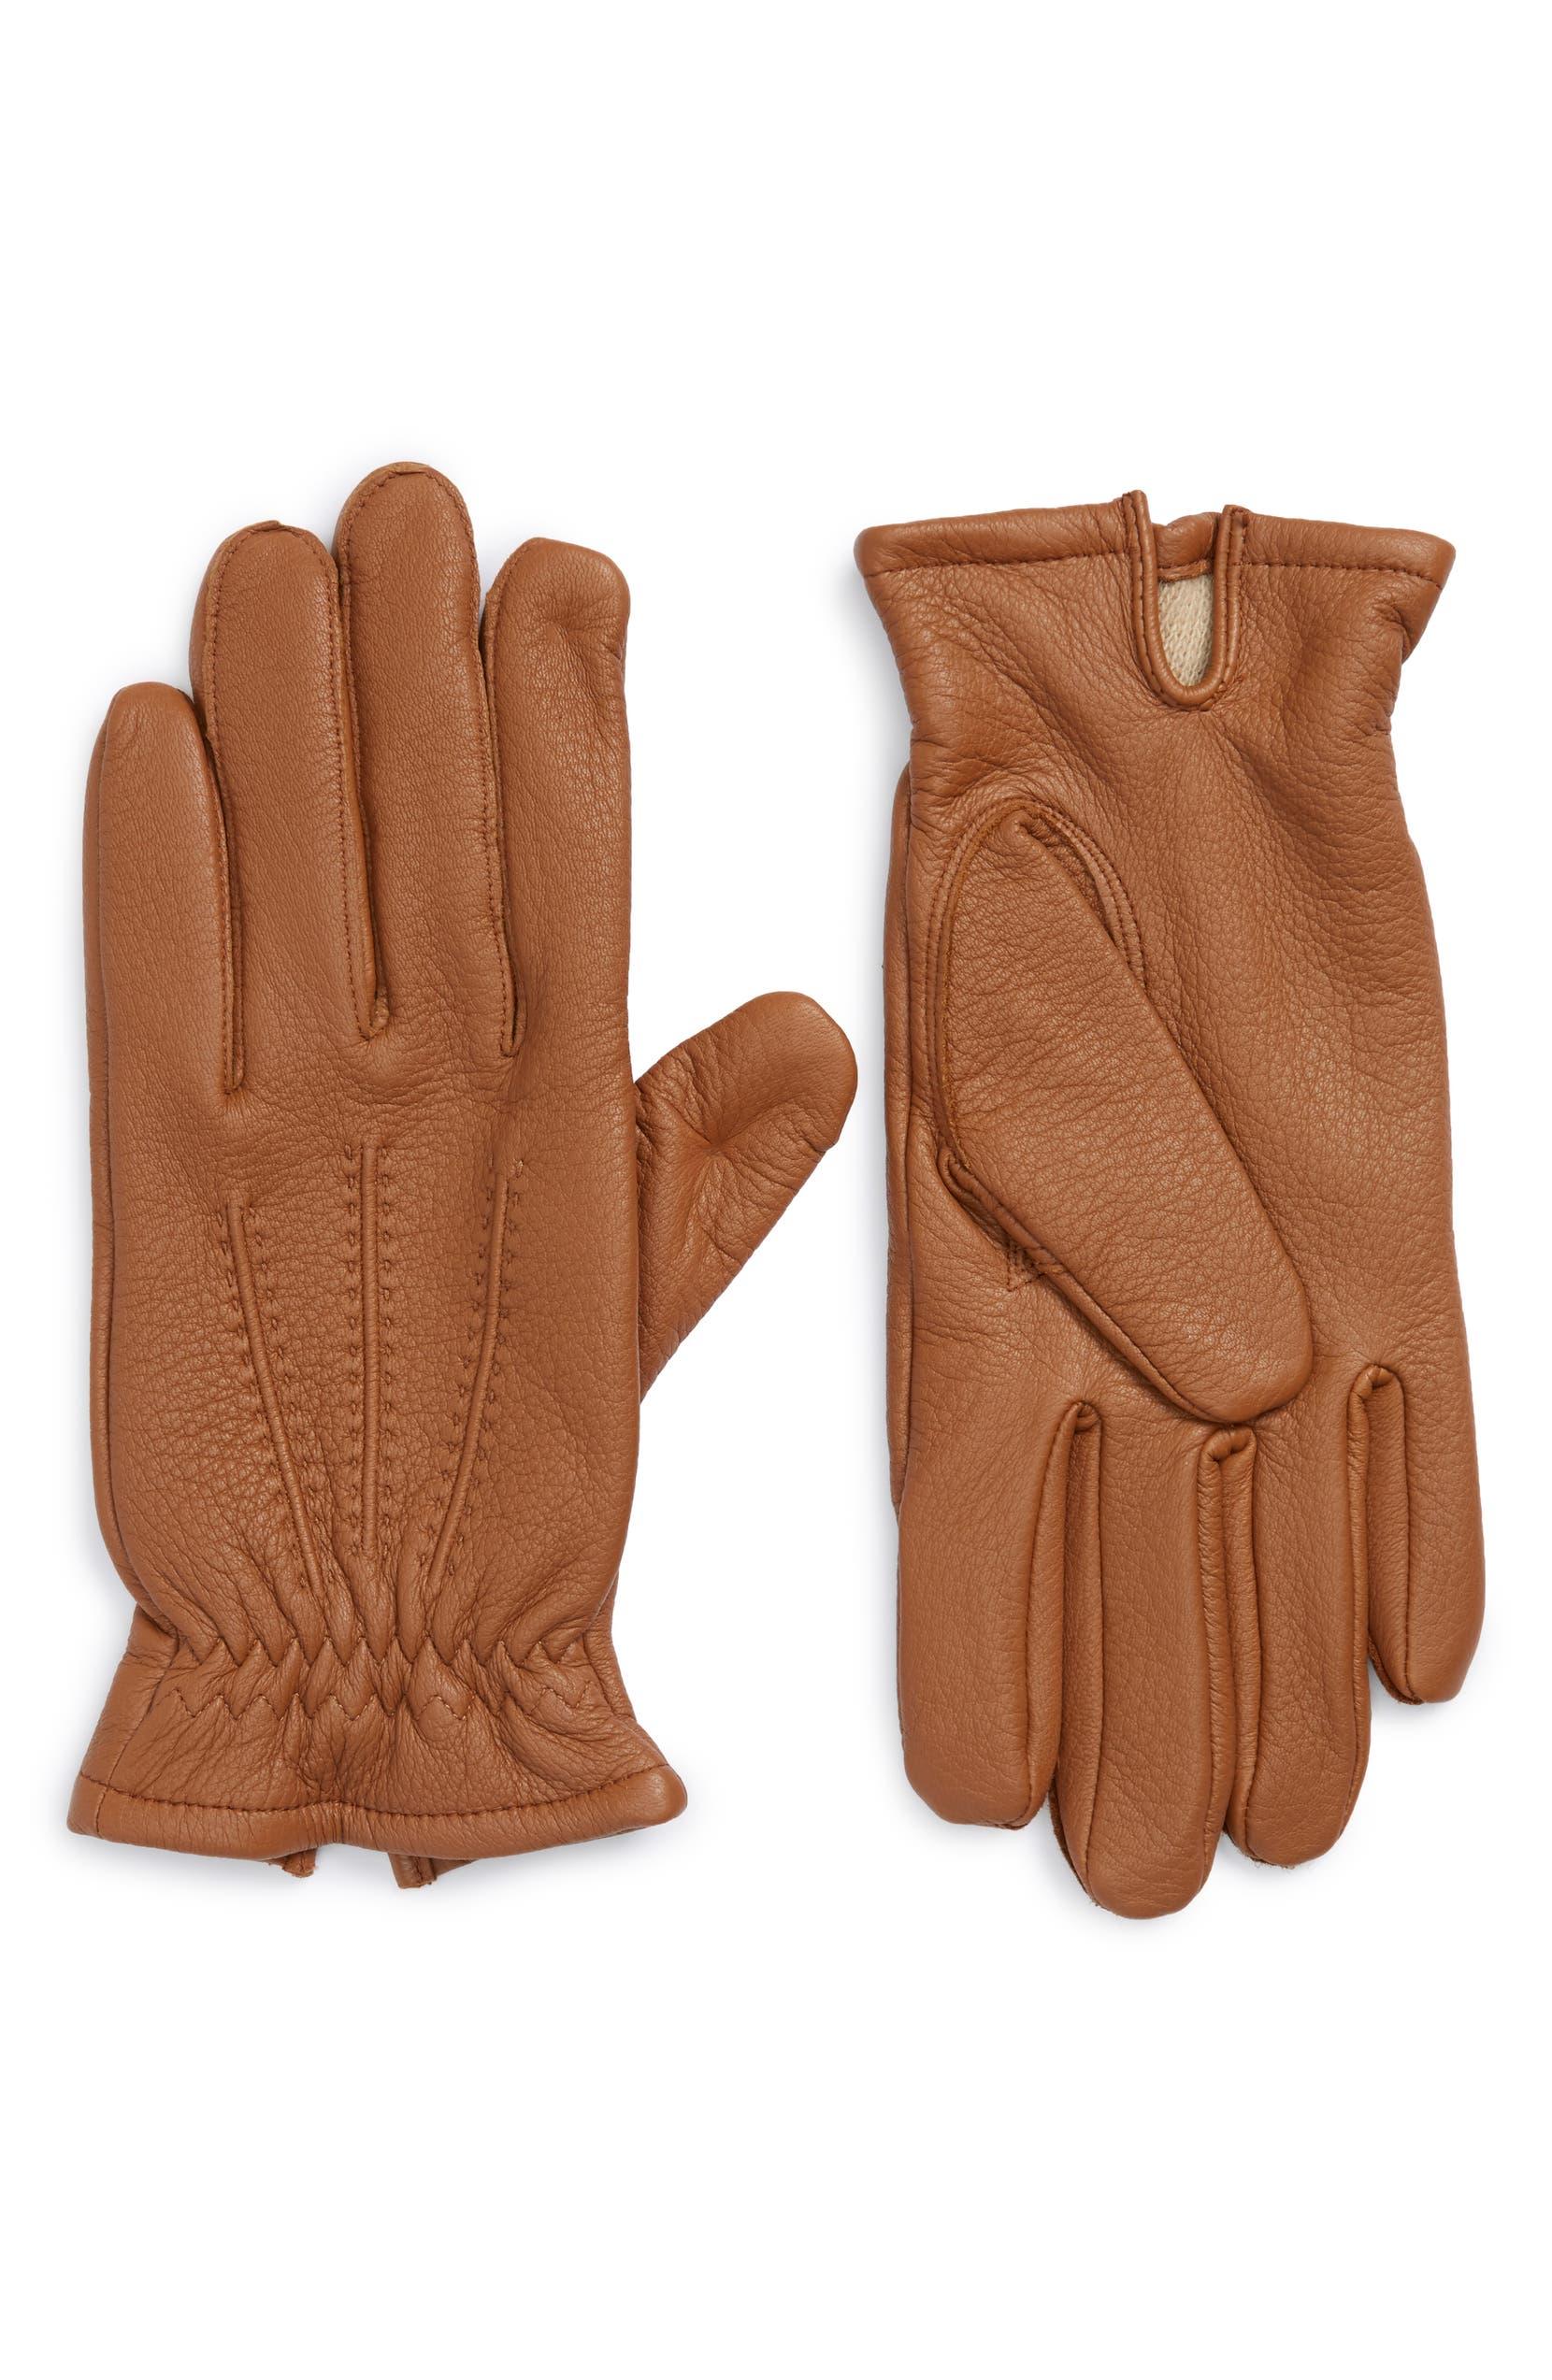 43164002f88 Deerskin Leather Gloves